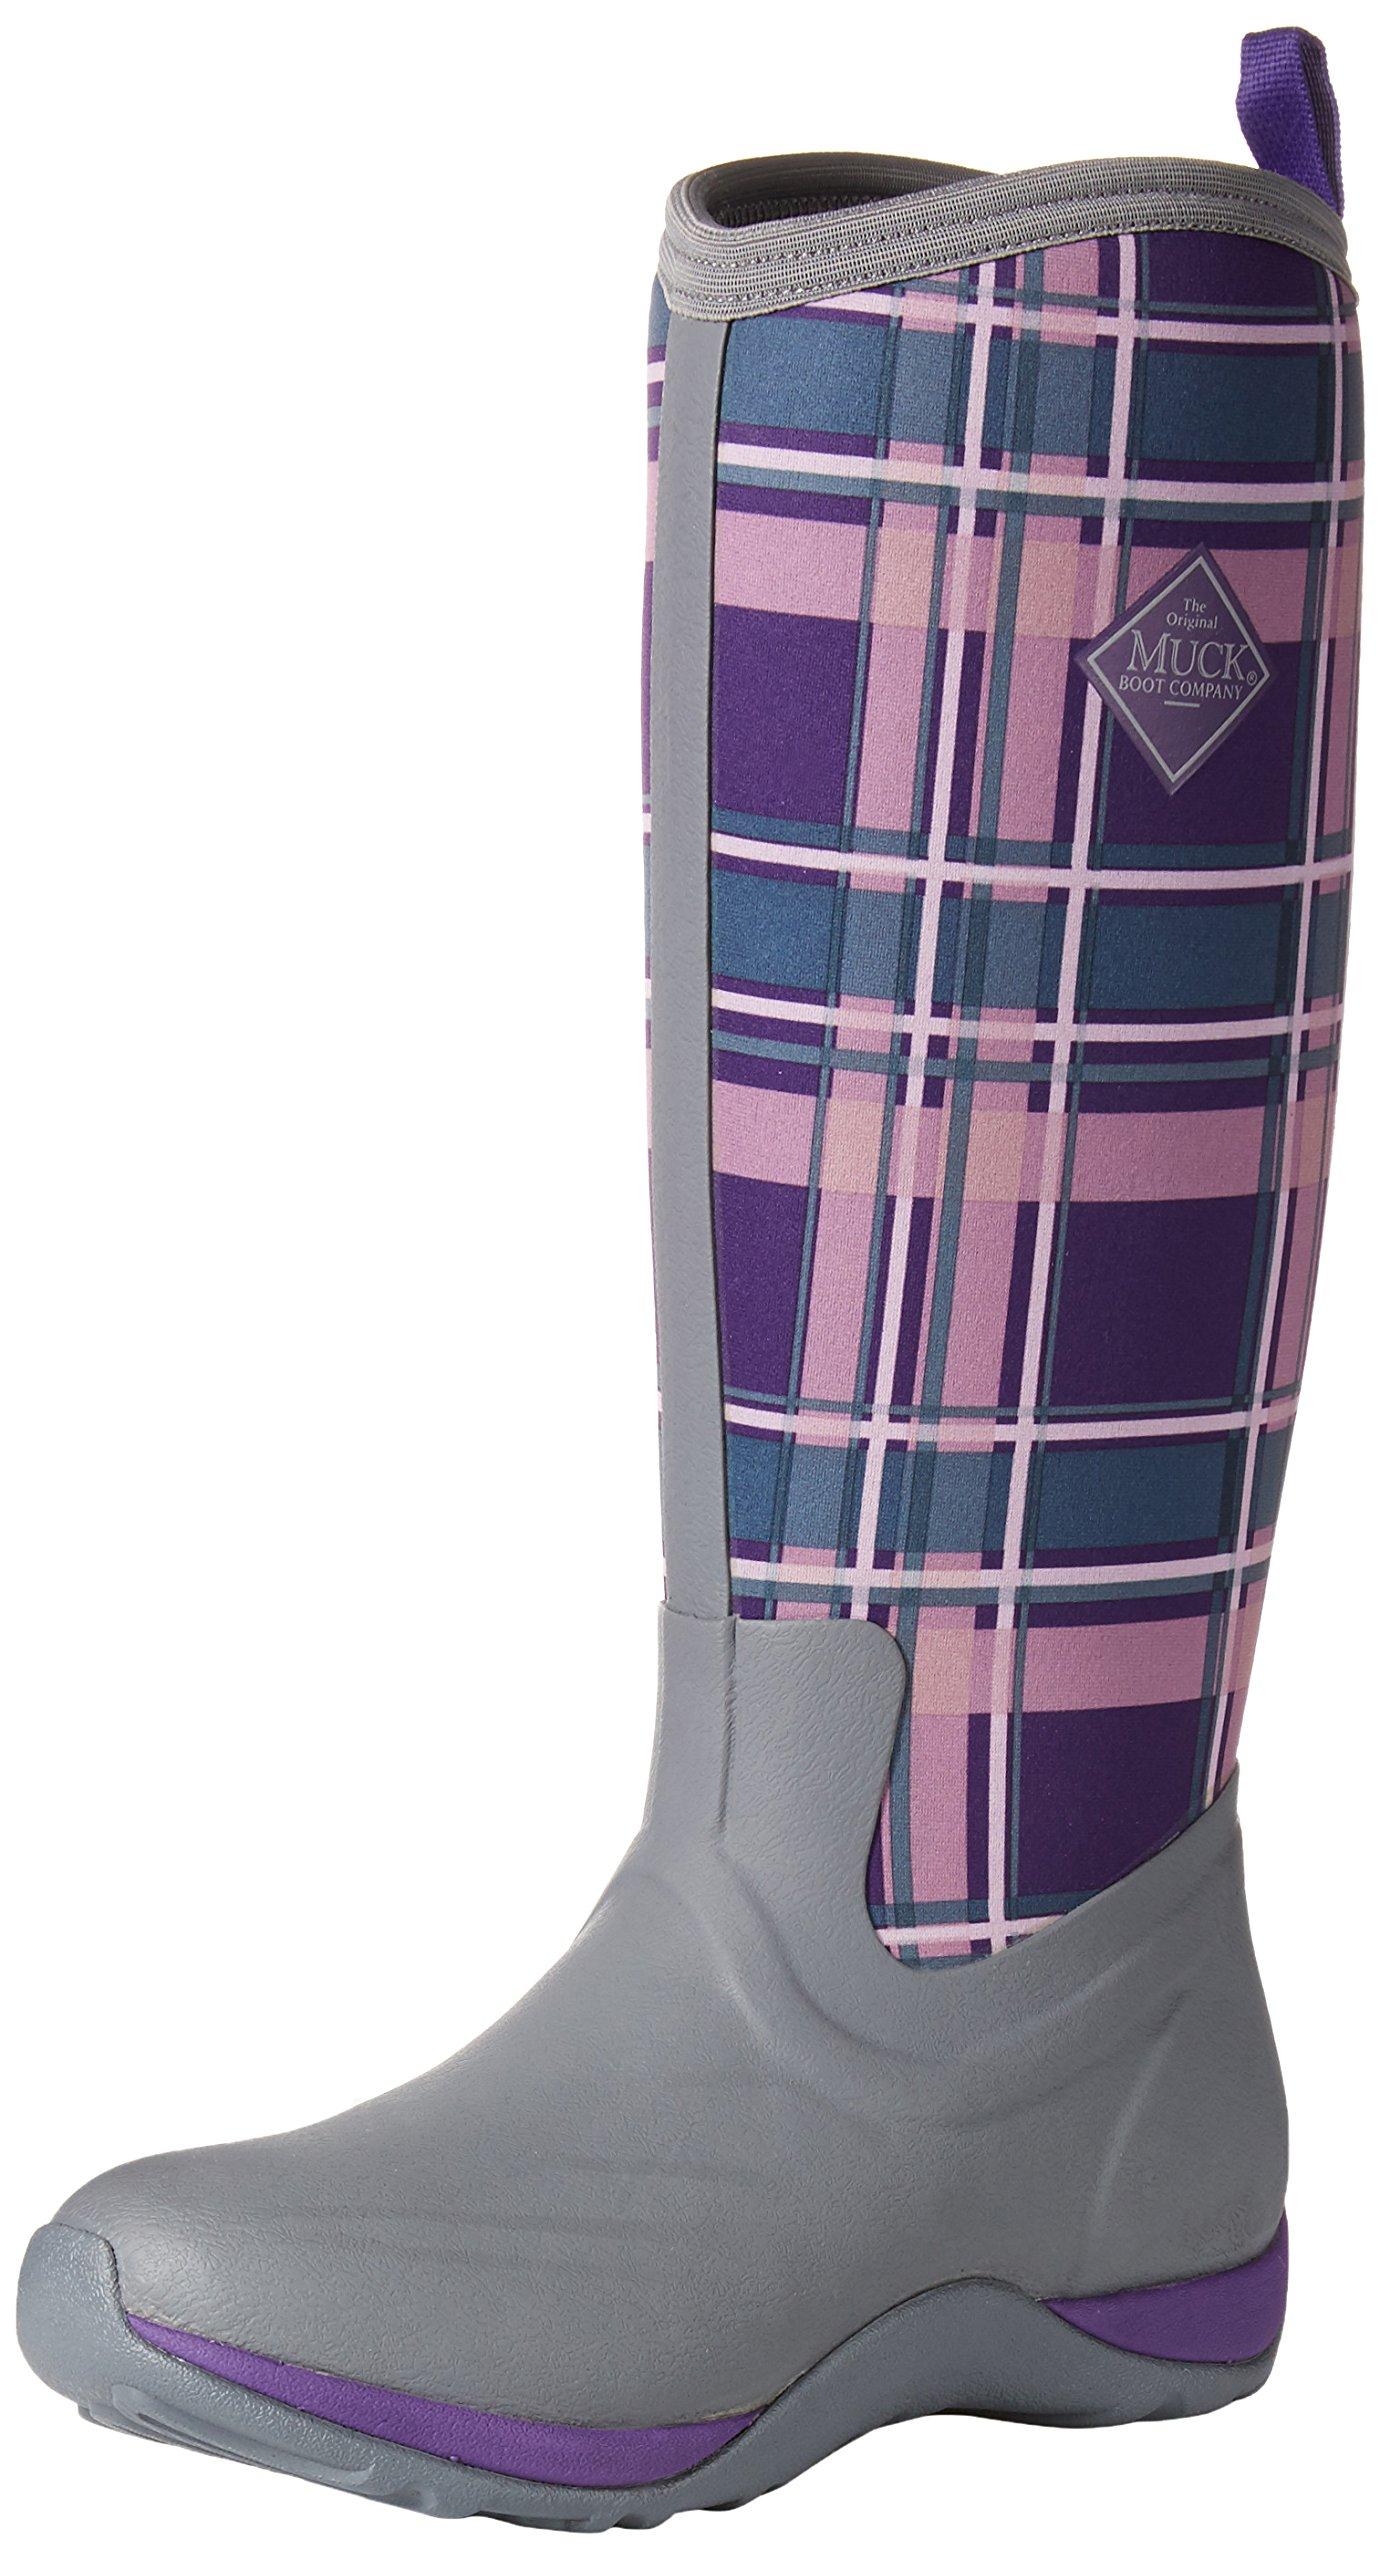 Muck Boot Women's Arctic Adventure Tall Snow Boot, Gray/Acai Purple Plaid, 8 US/8 M US